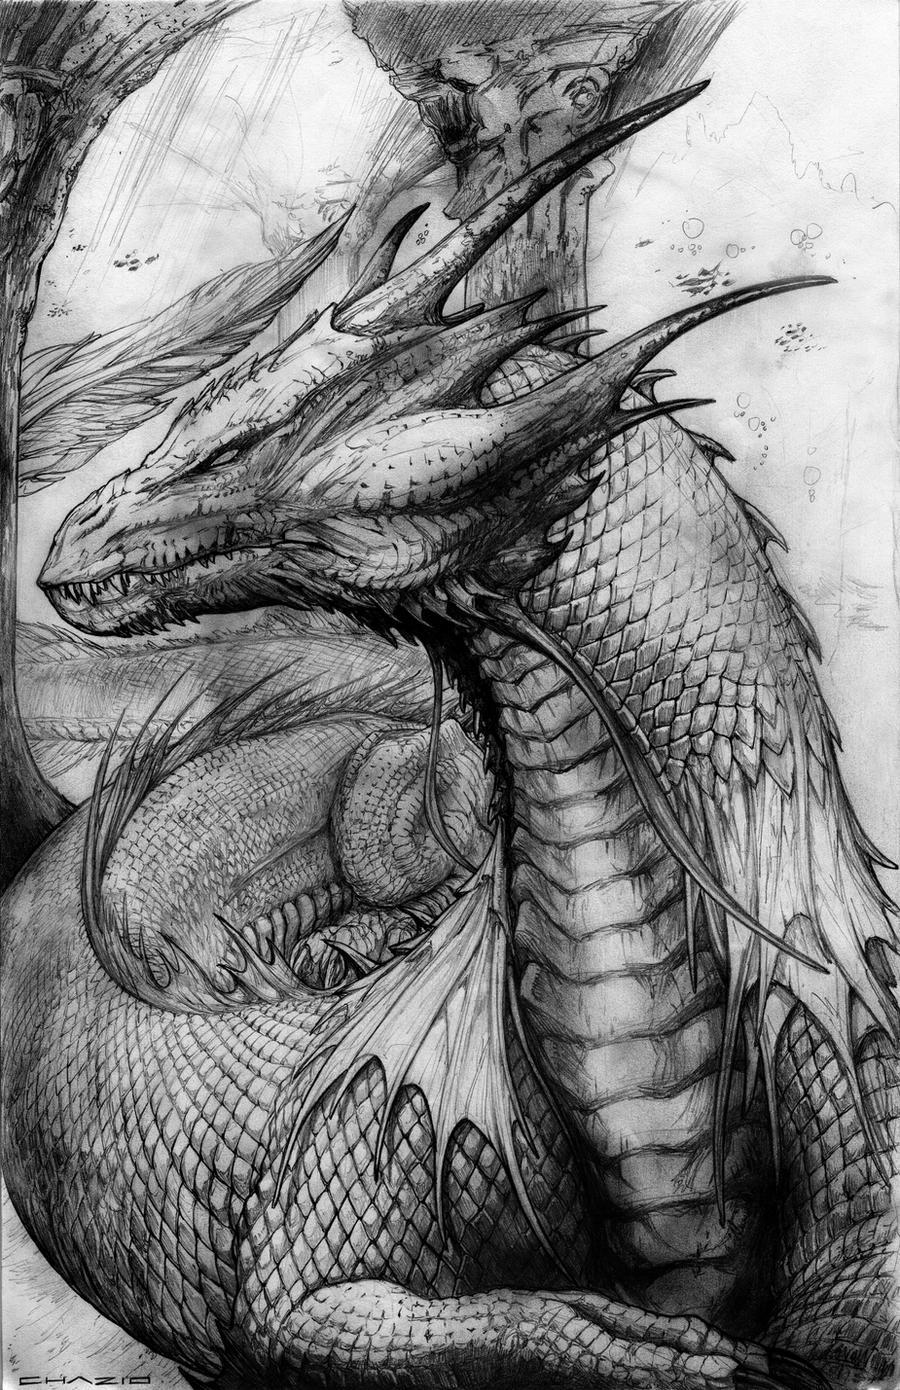 Sand Dragon by ChuckWalton on DeviantArt